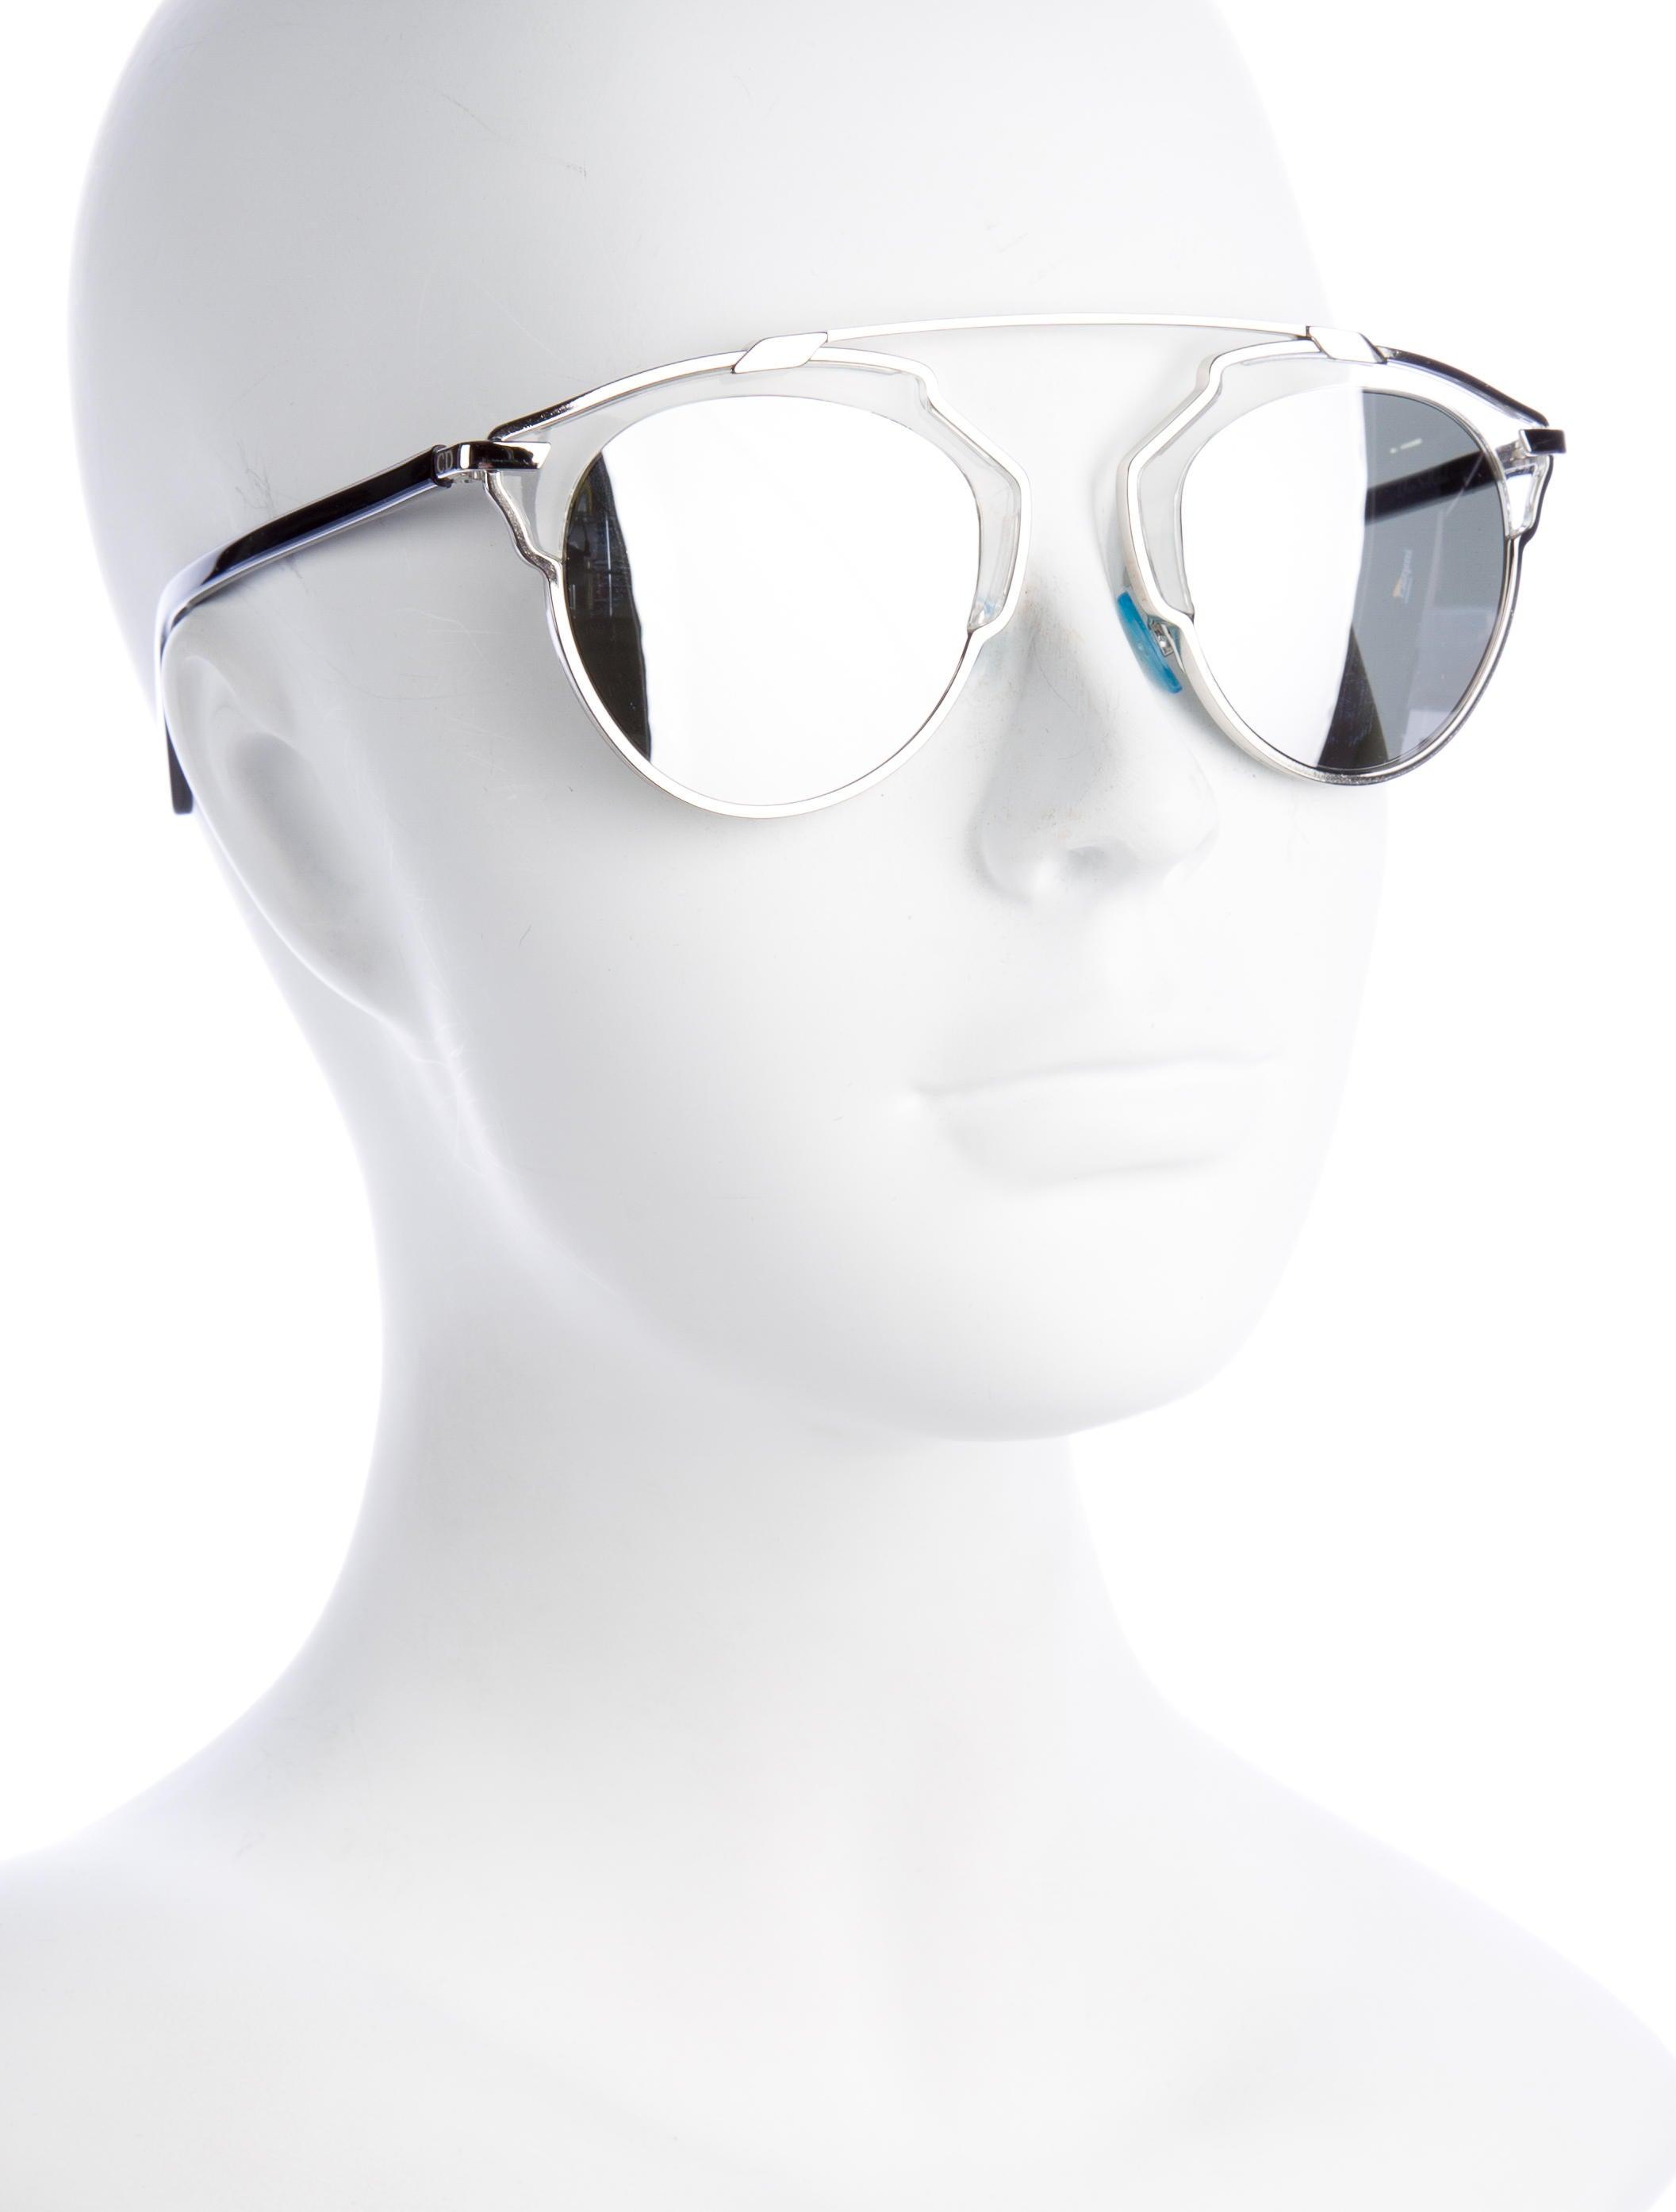 a74b86c6d1 Christian Dior Dior So Real Mirrored Sunglasses - Accessories - CHR52636